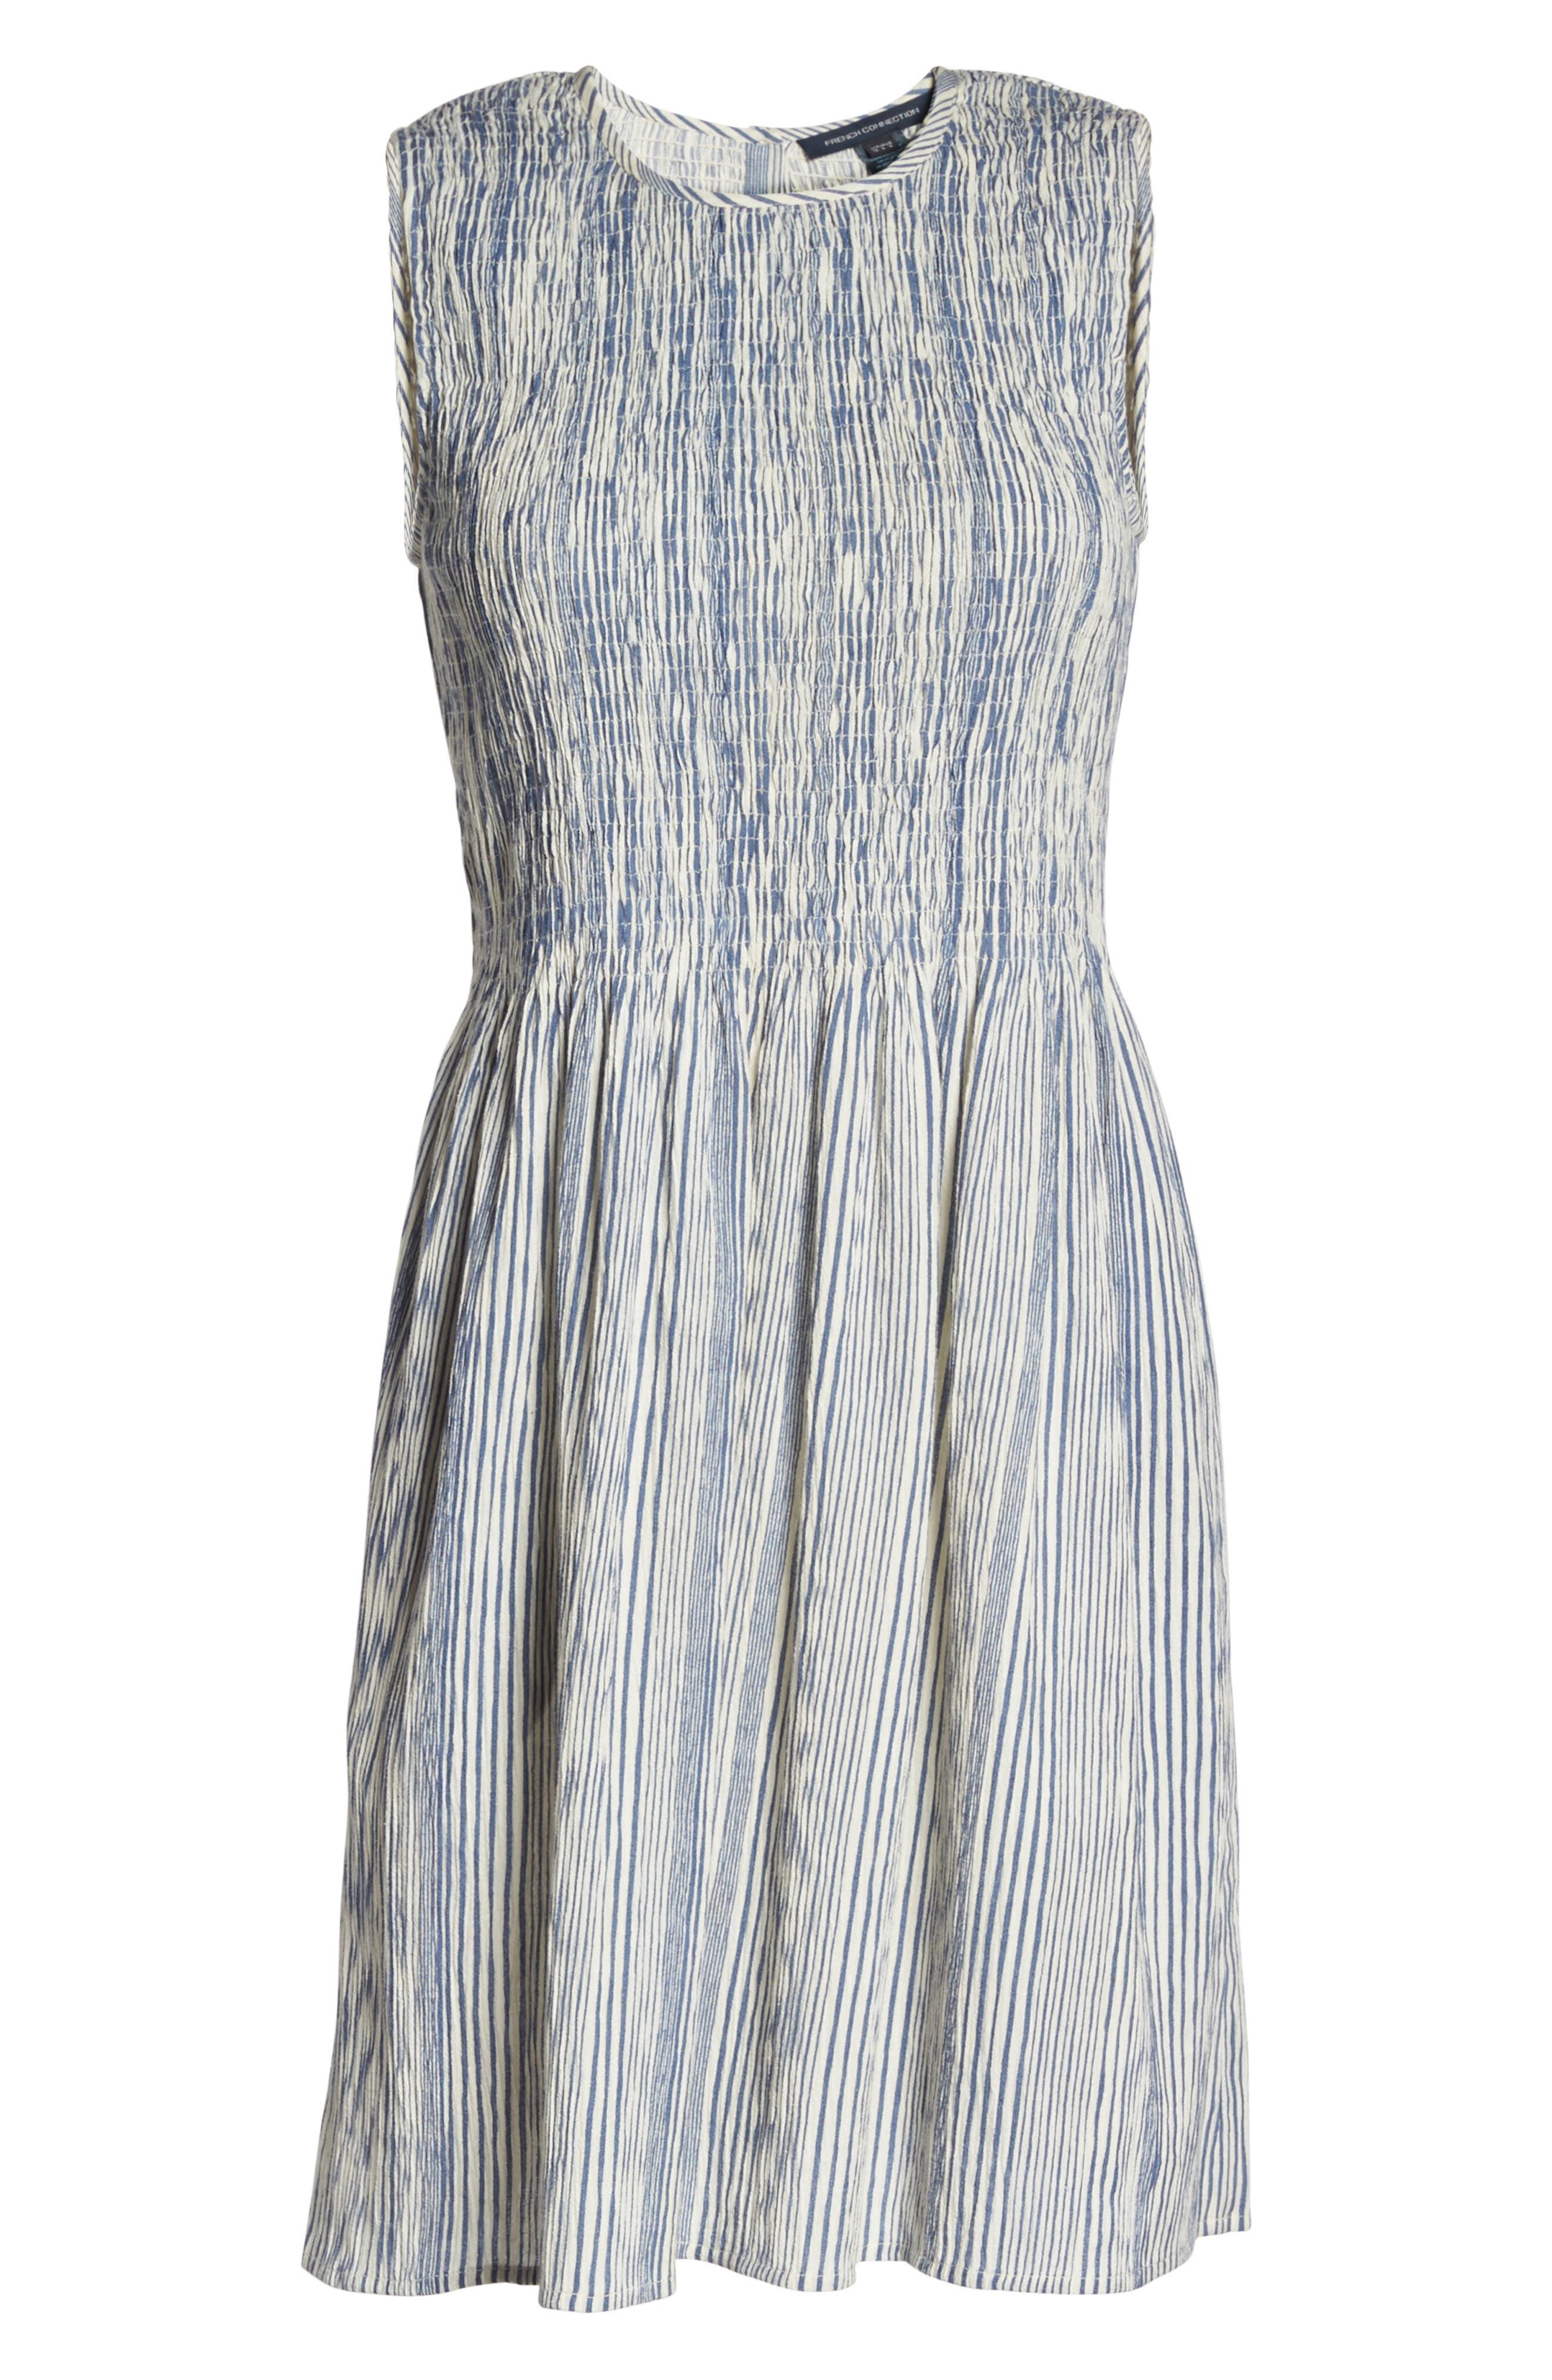 Serge Smocked Dress,                             Alternate thumbnail 6, color,                             Indian Ocean